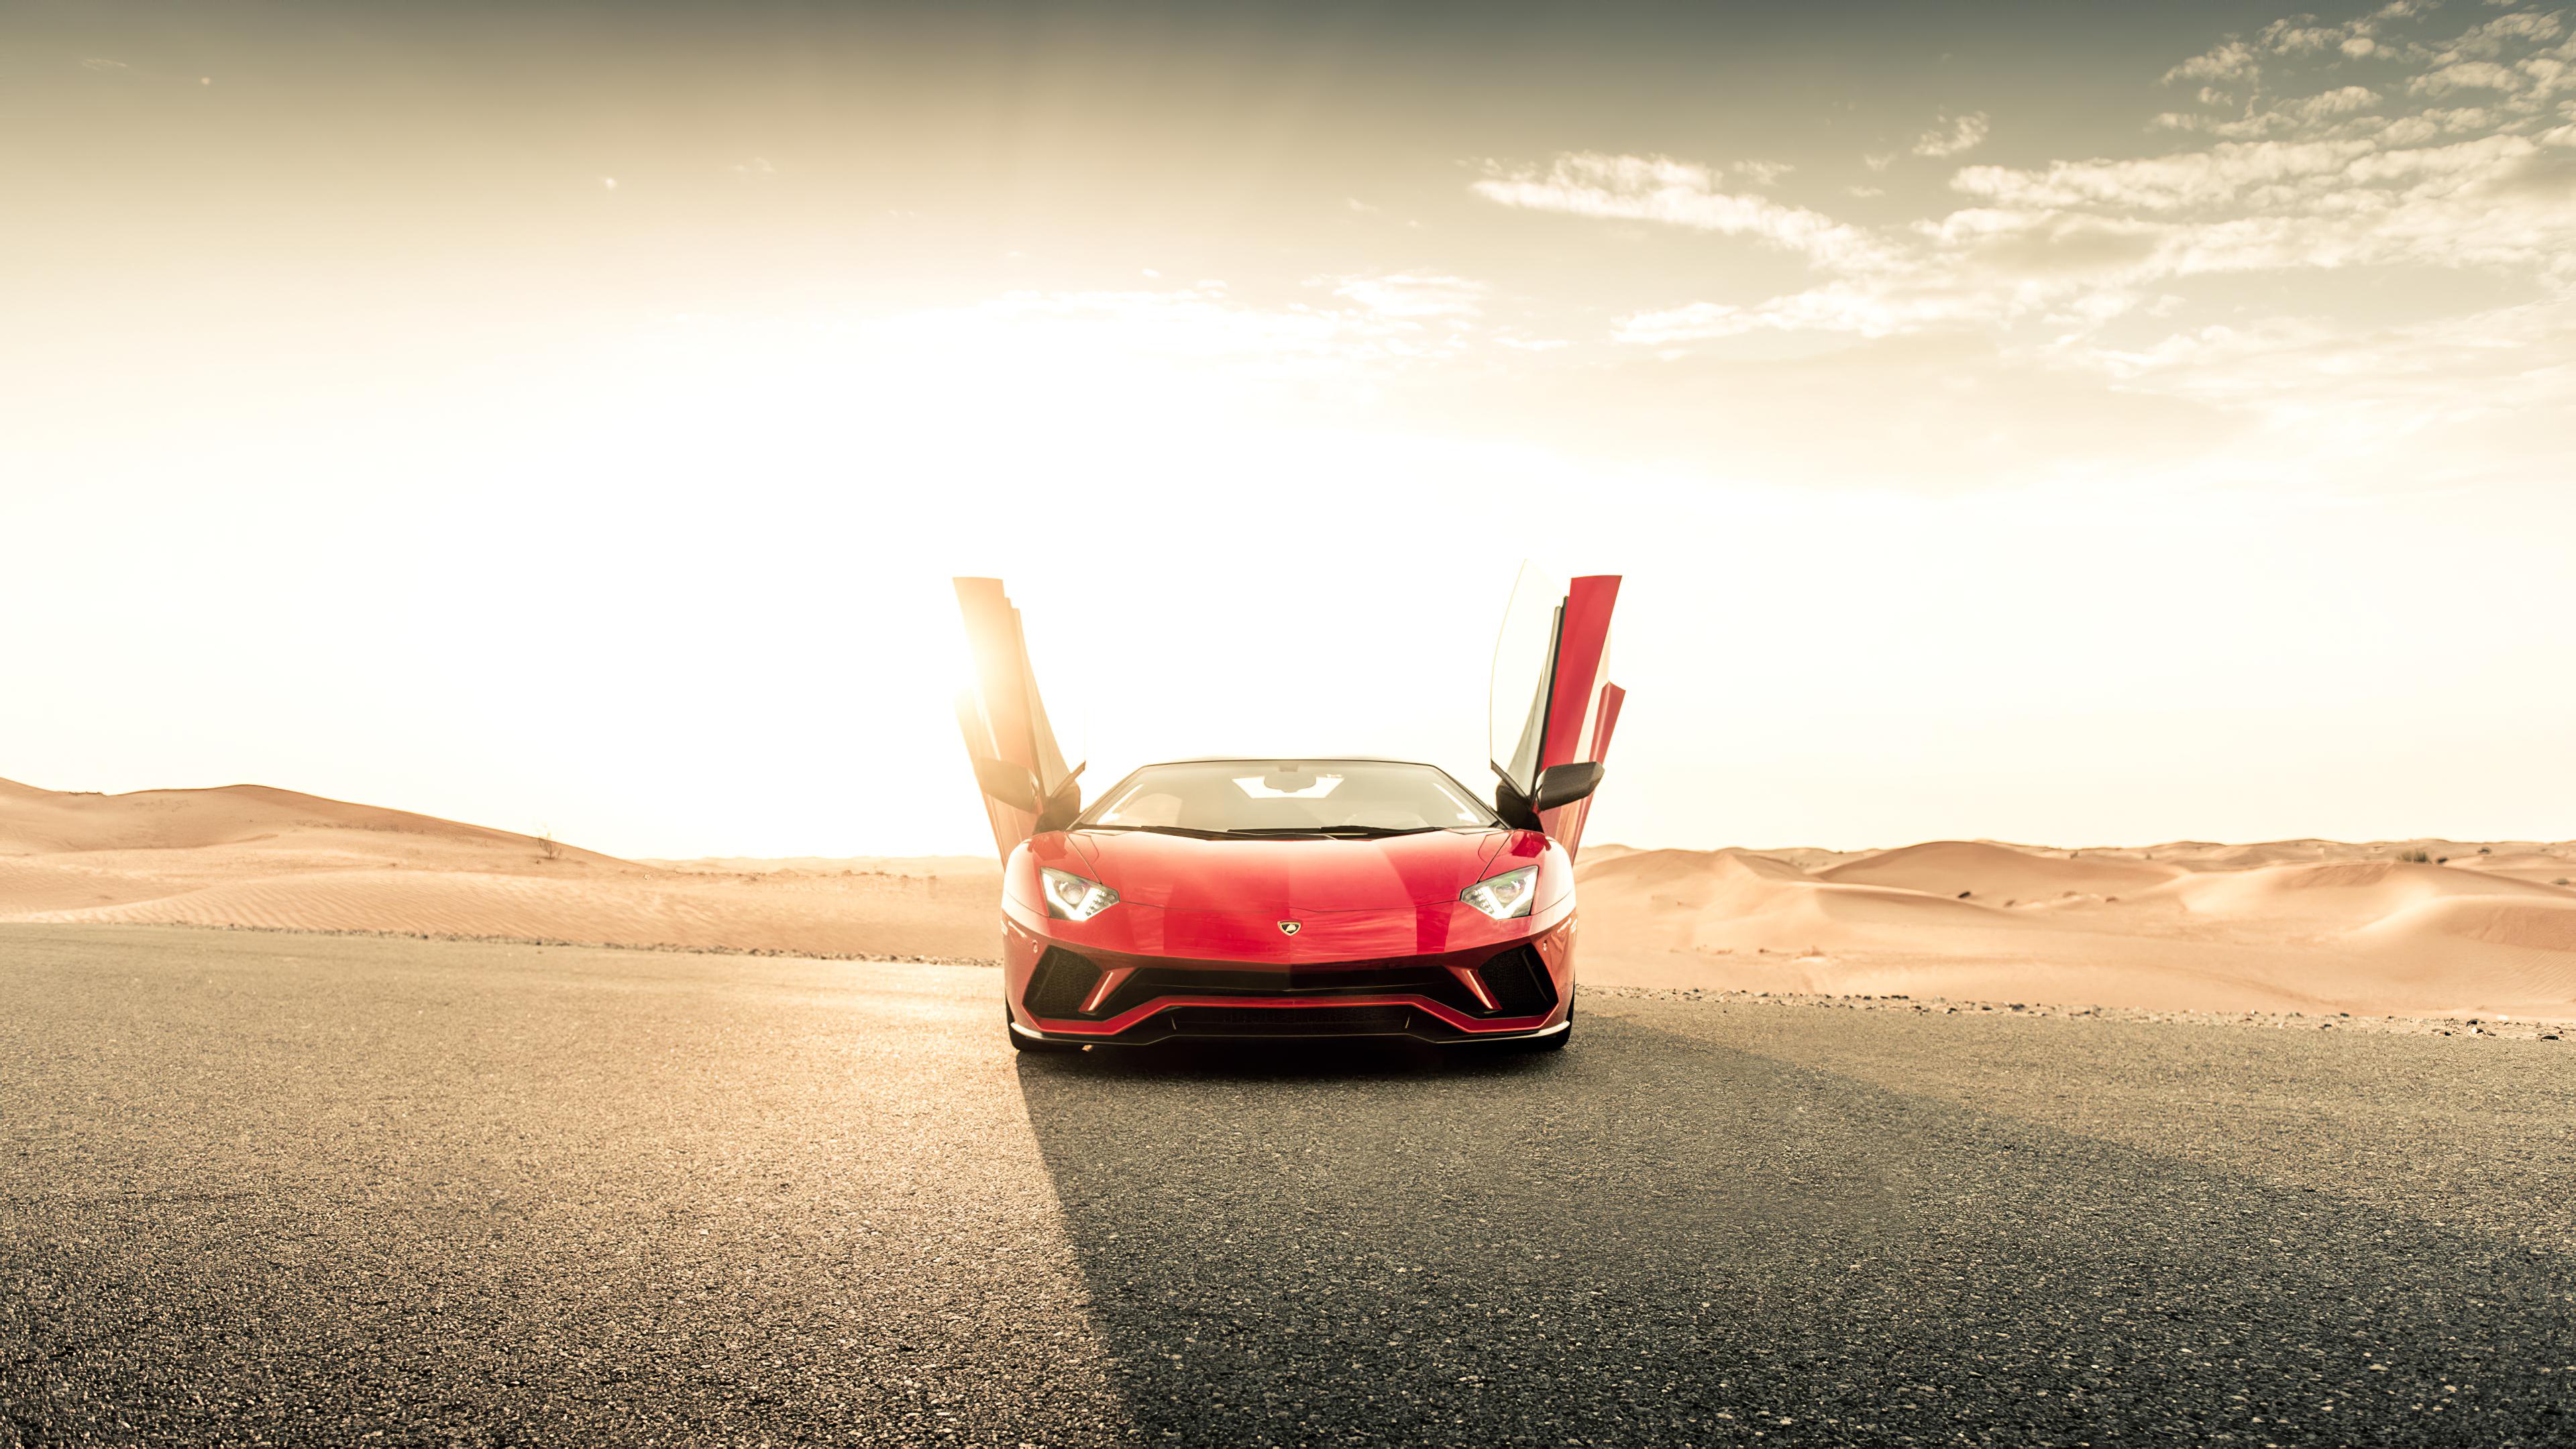 lamborghini aventador s roadster 2020 doors open 1579649274 - Lamborghini Aventador S Roadster 2020 Doors Open -